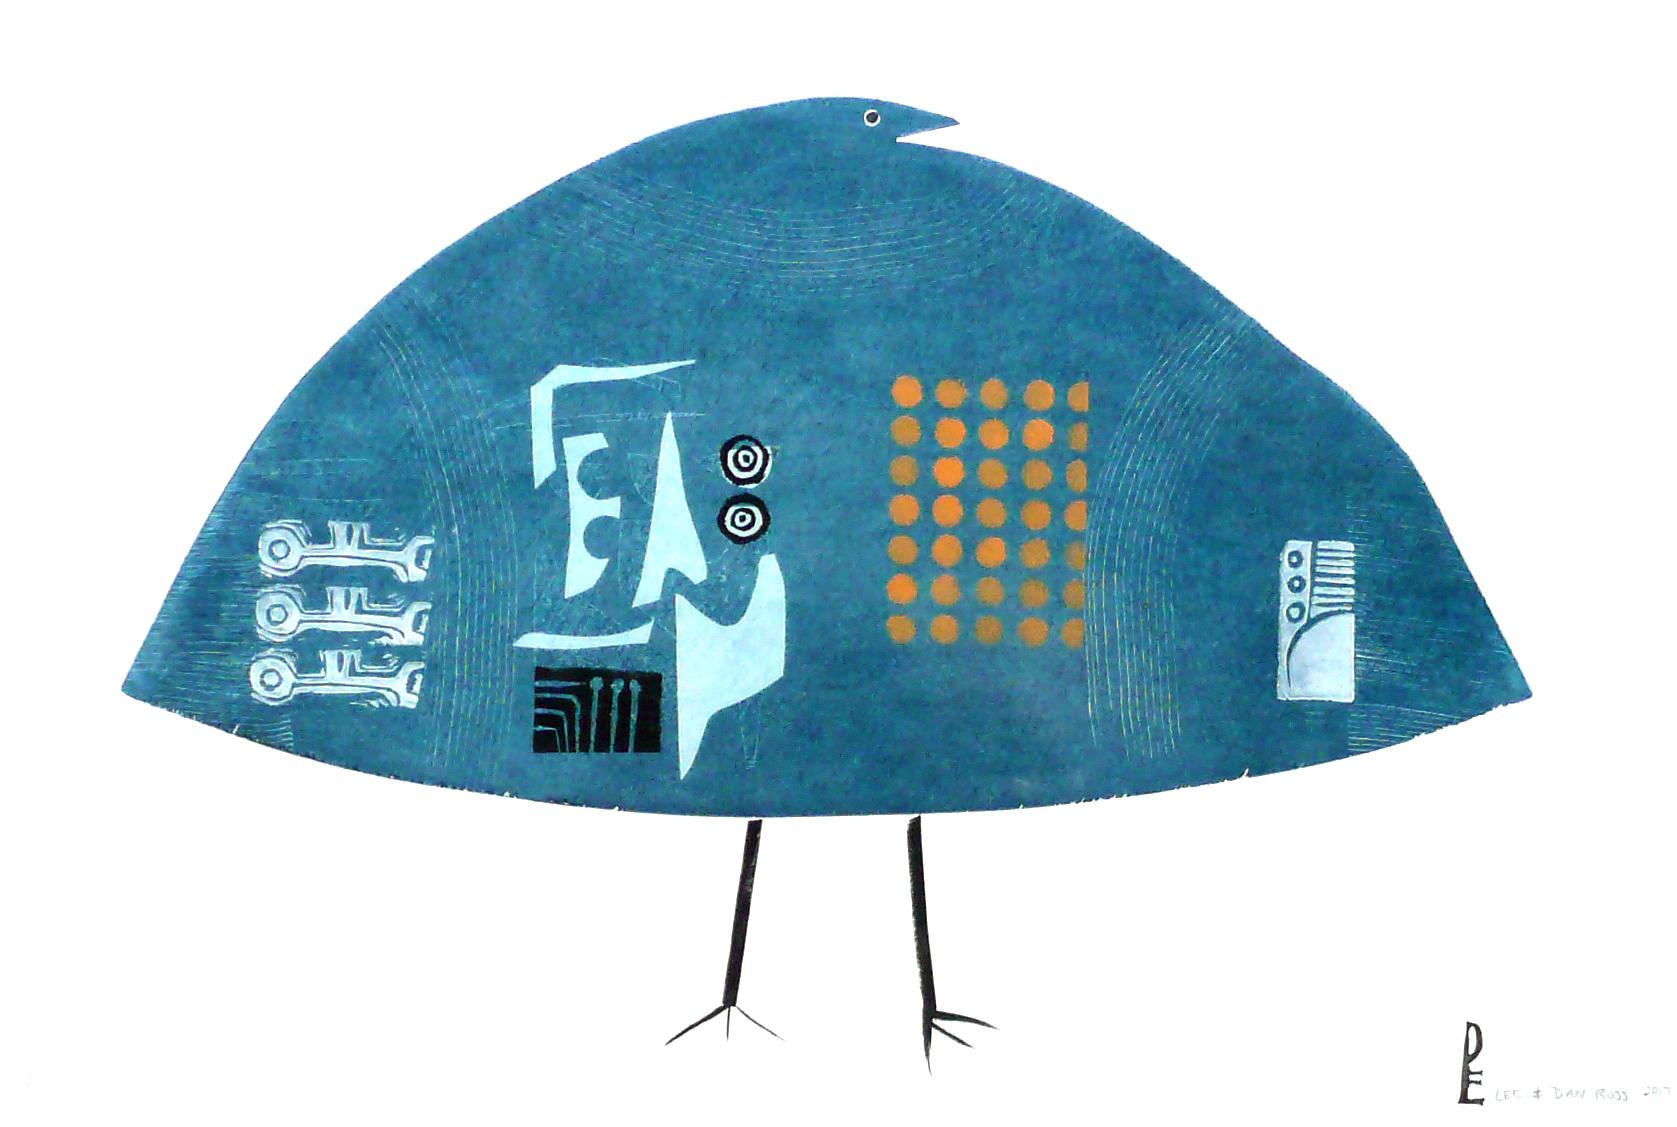 bluebird-1.jpg